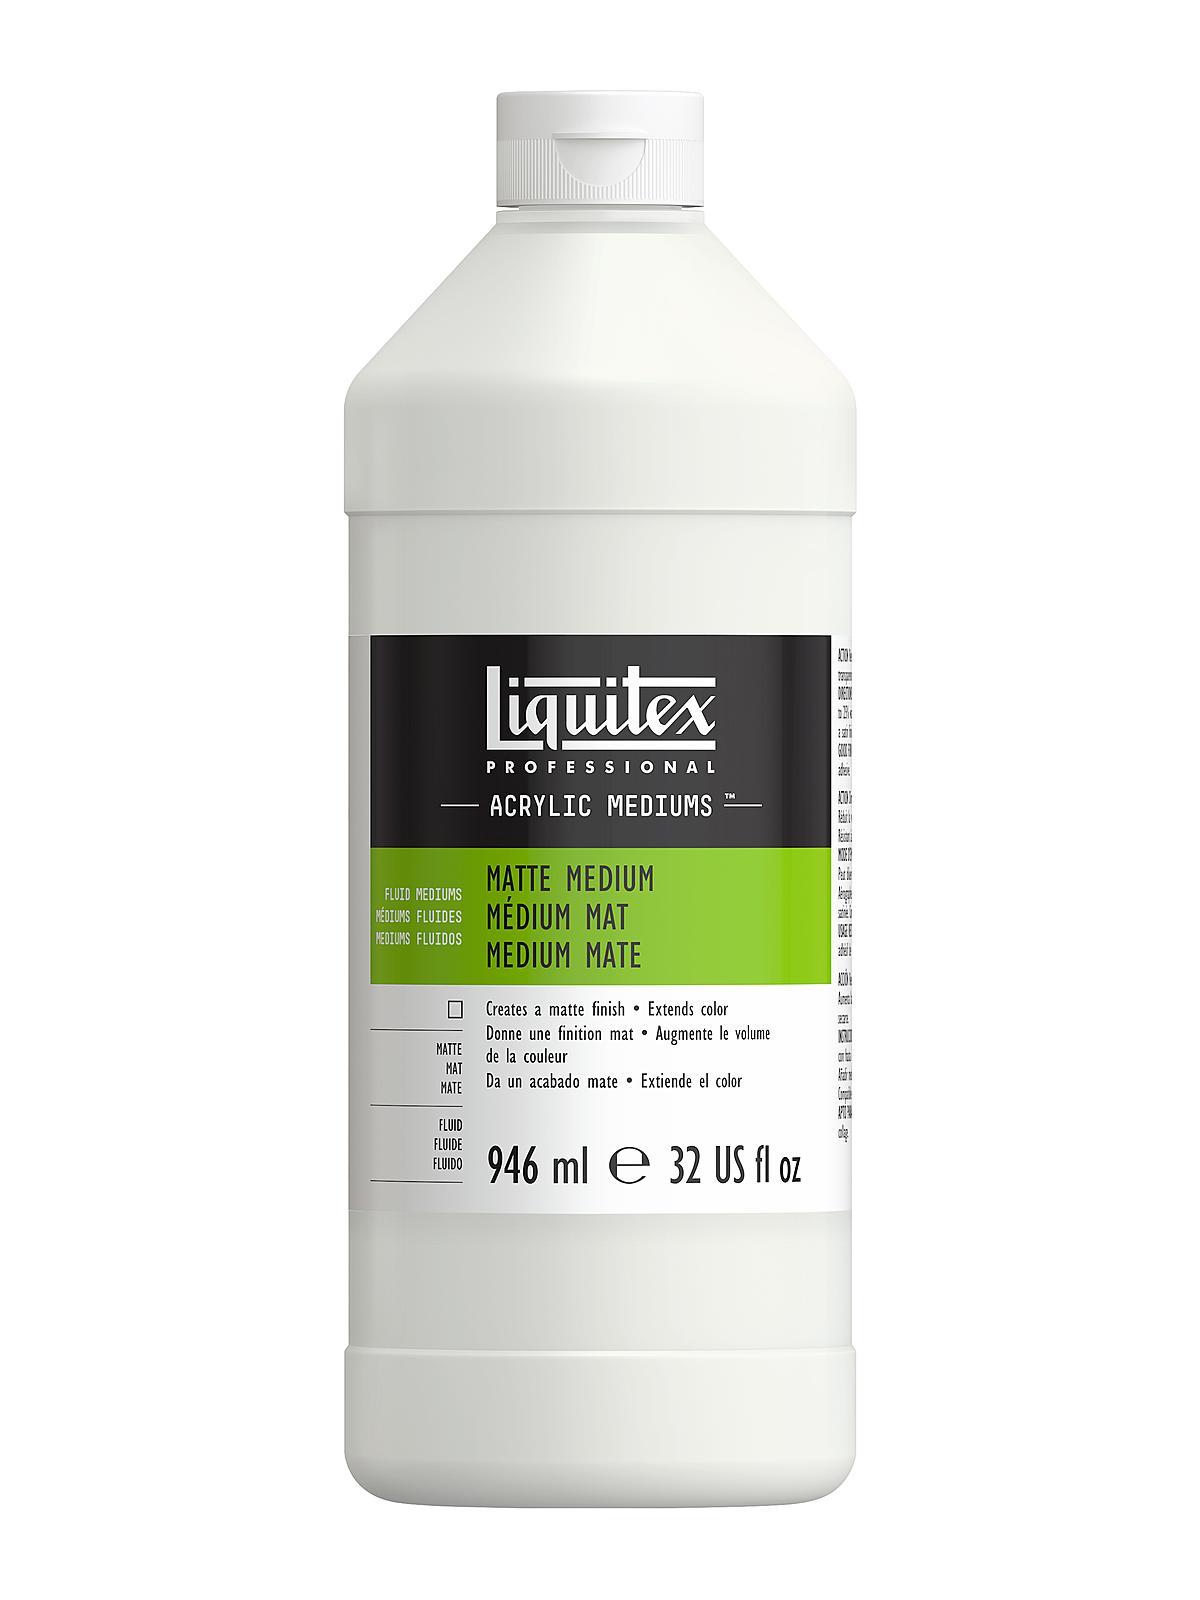 Liquitex acrylic matte medium for Gloss medium for acrylic painting